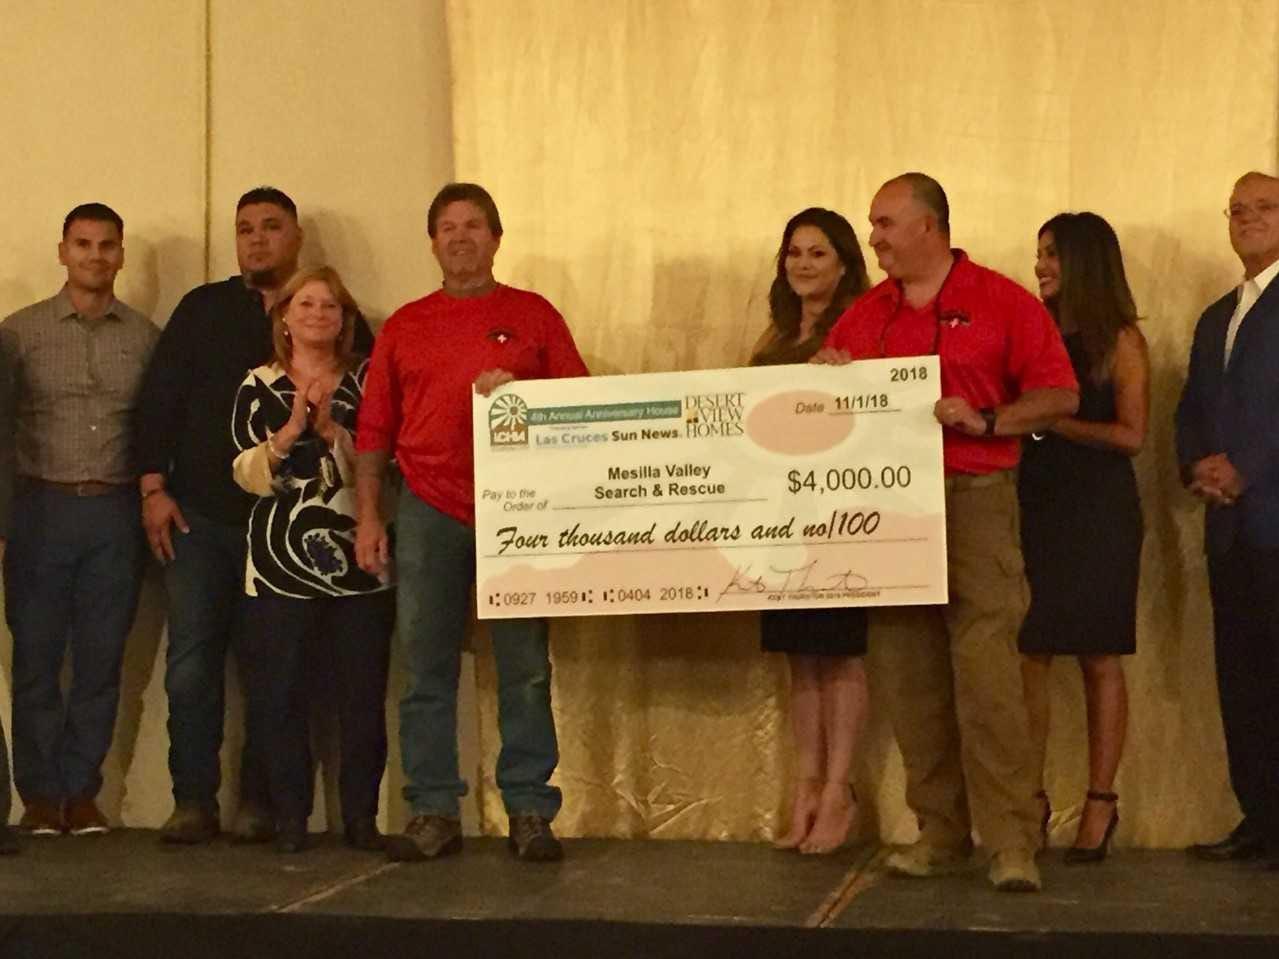 Mesilla Valley Search and Rescue, $4,000